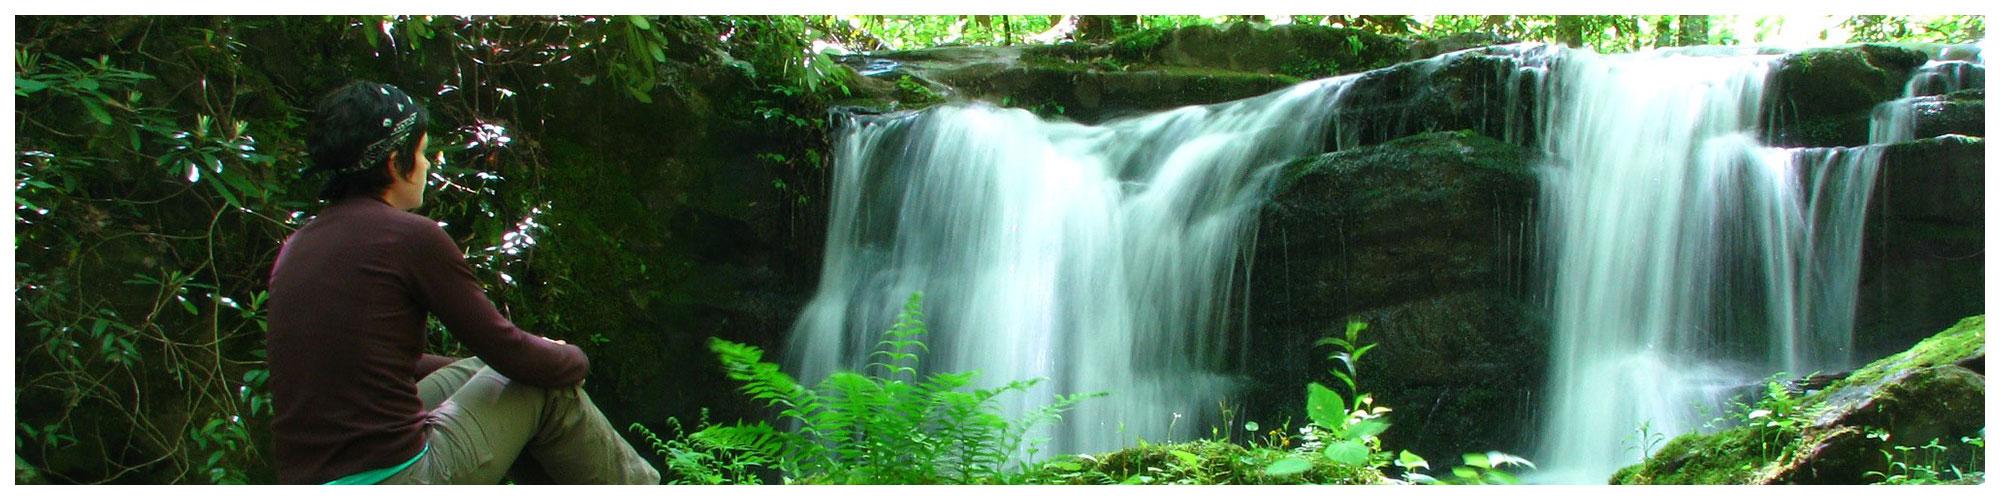 A Walk in the Woods (Header Background) | Gatlinburg Attractions